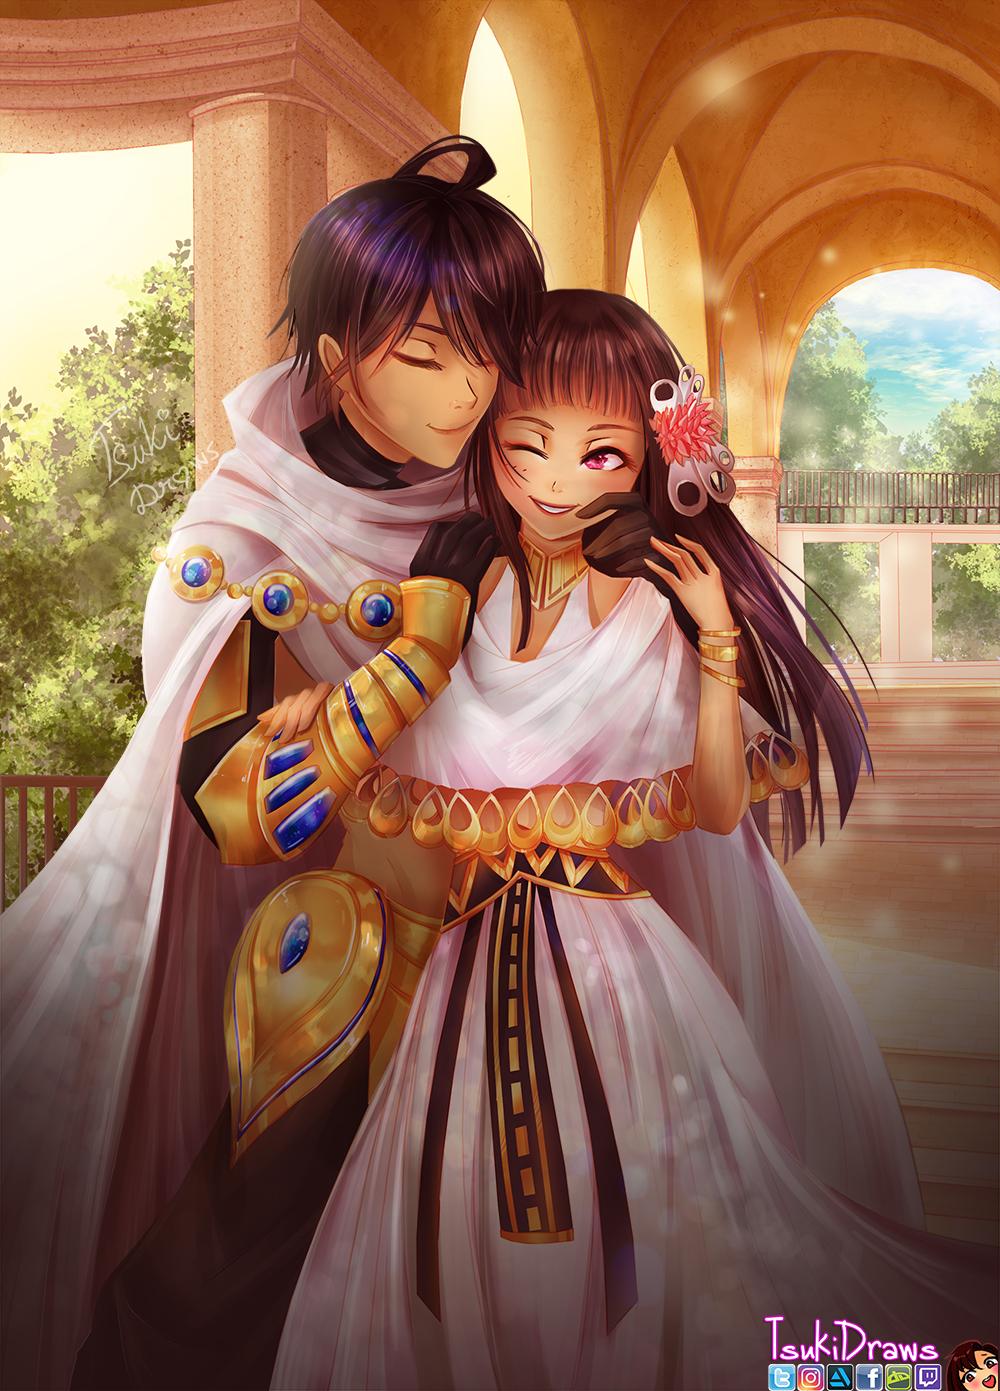 Ozymandias and Nefertari by TsukiDraws on DeviantArt